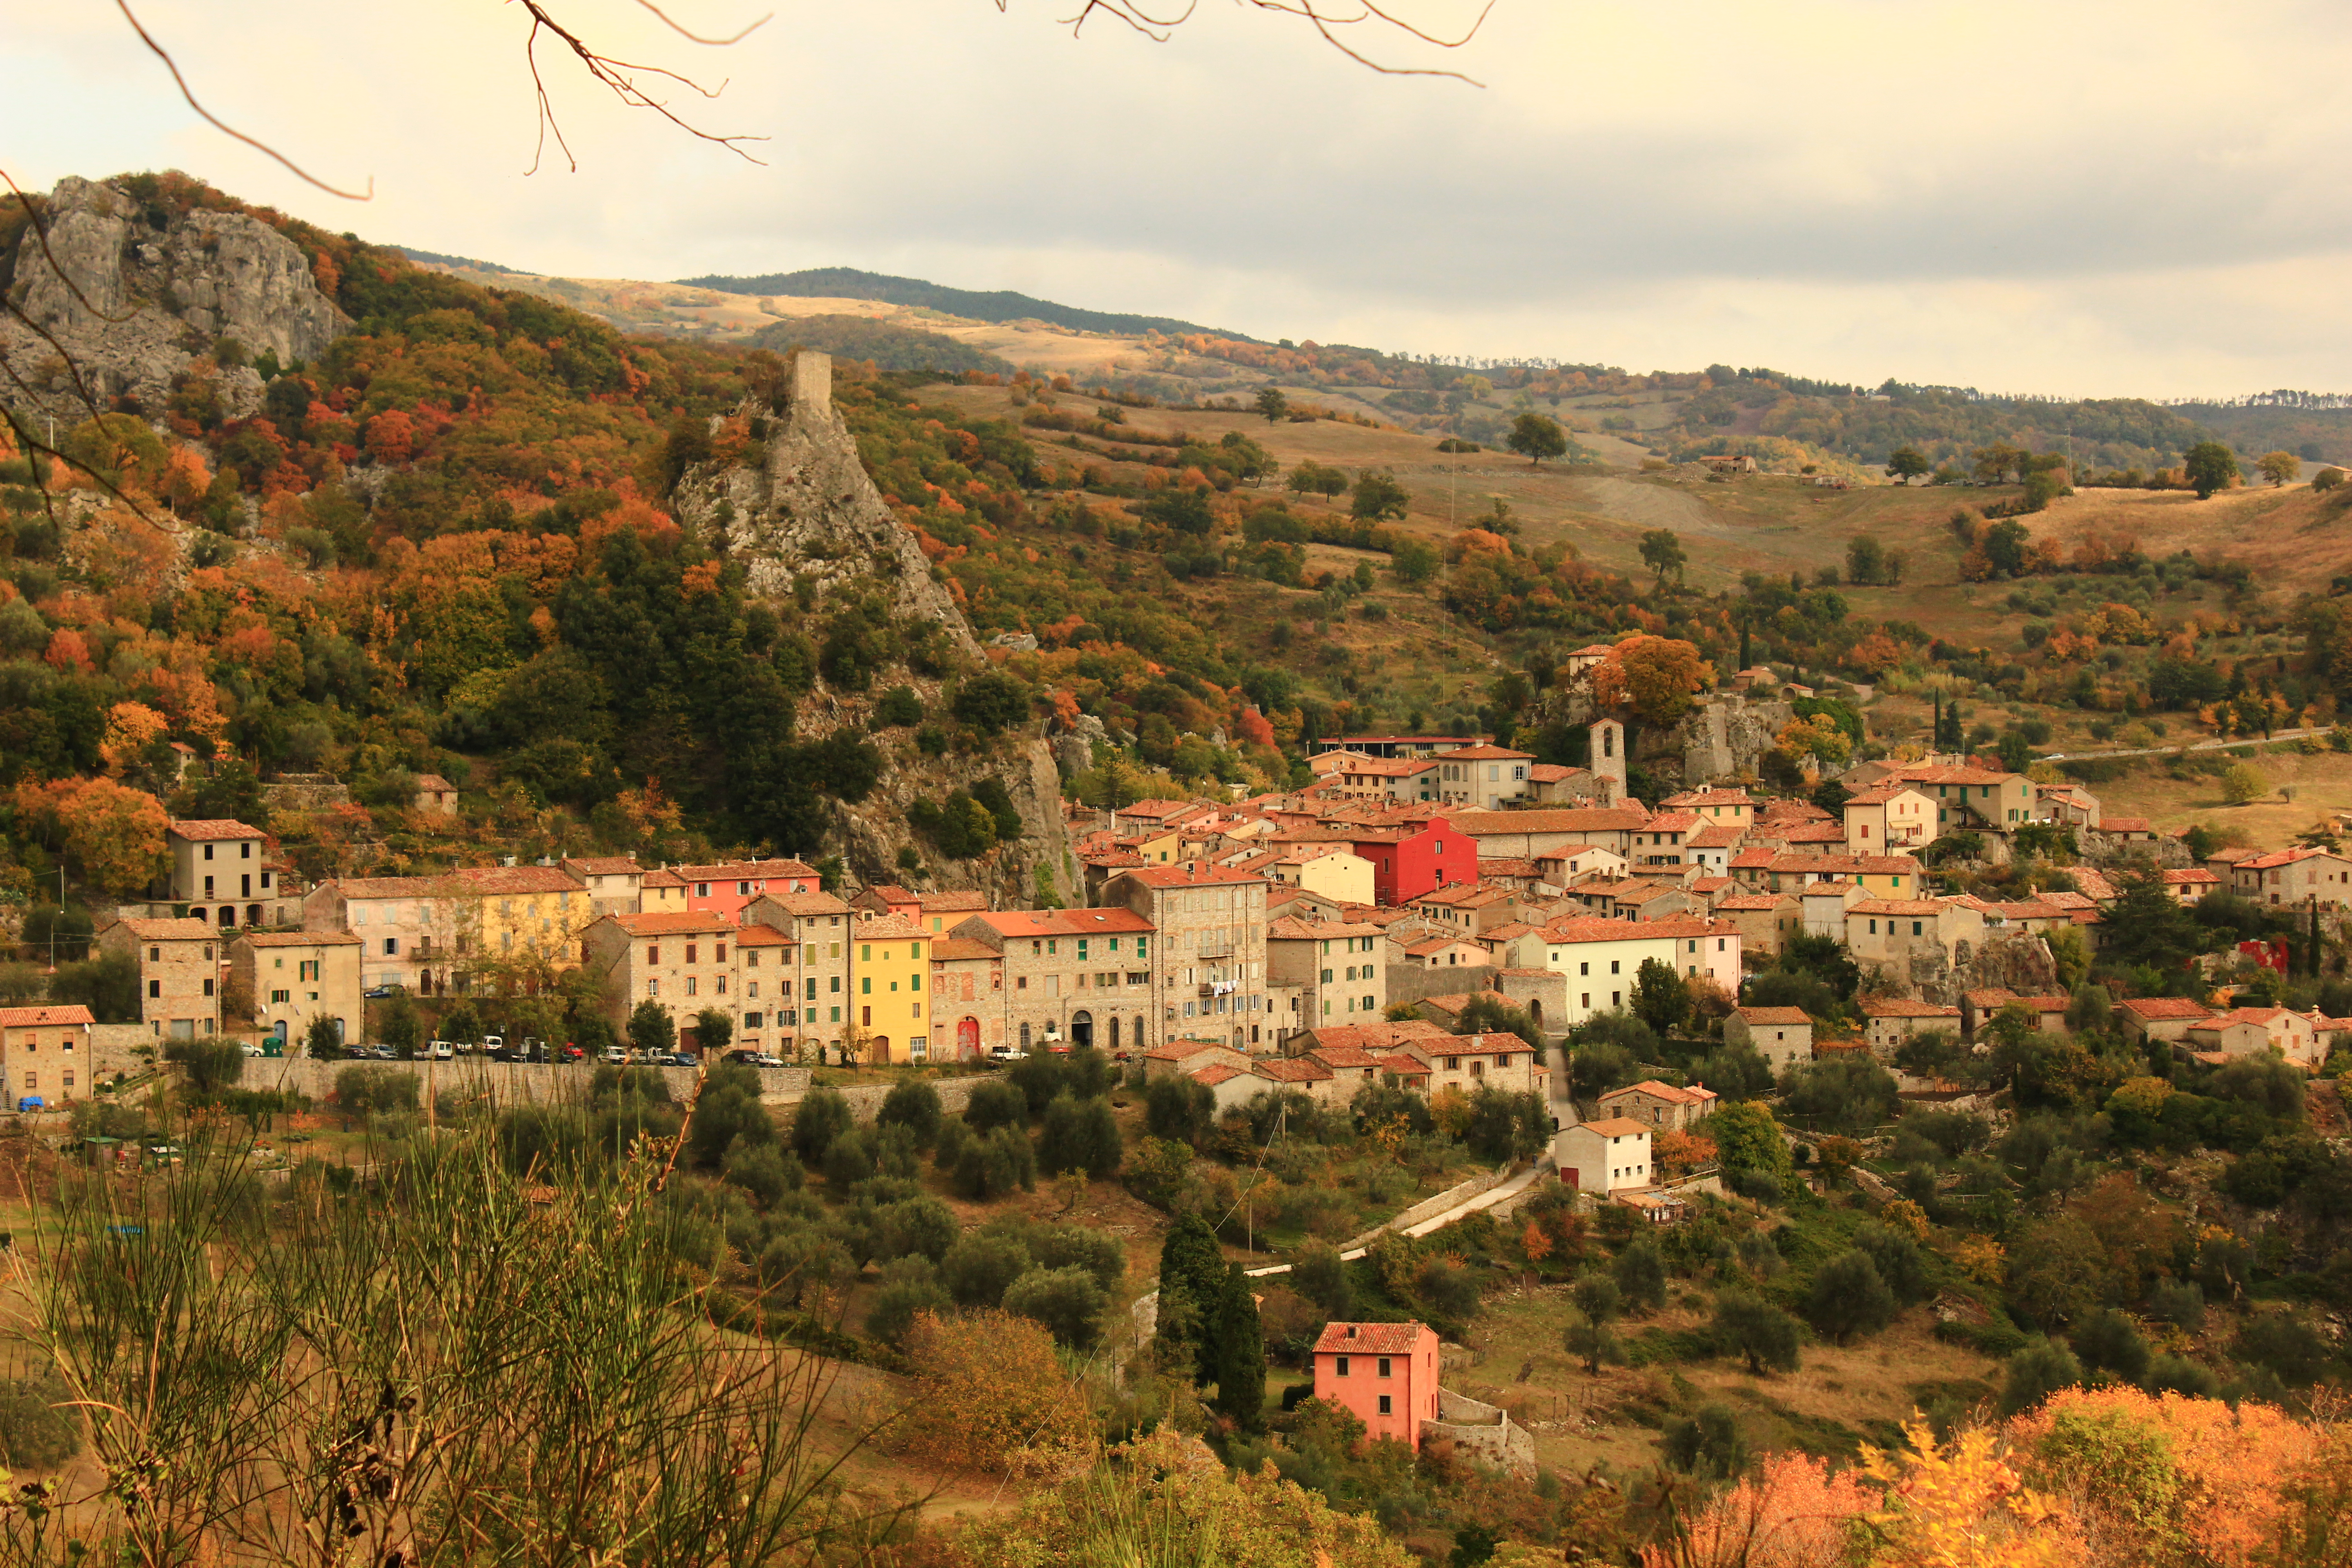 Panorama di Roccalbegna.JPG